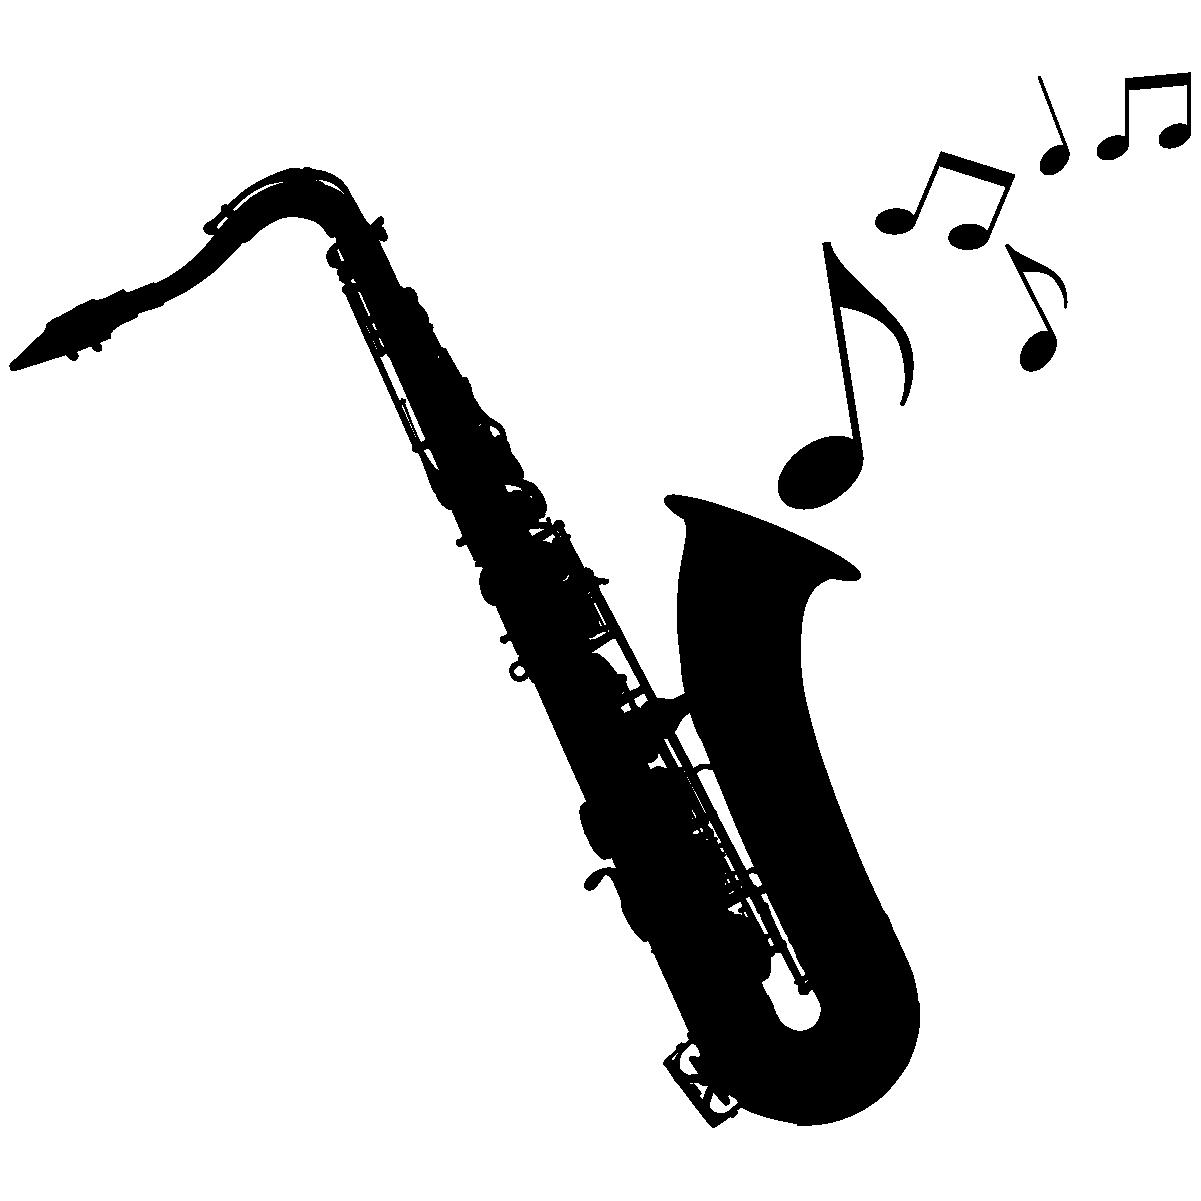 PONTINHO SAXOFONE 2015 FODAA